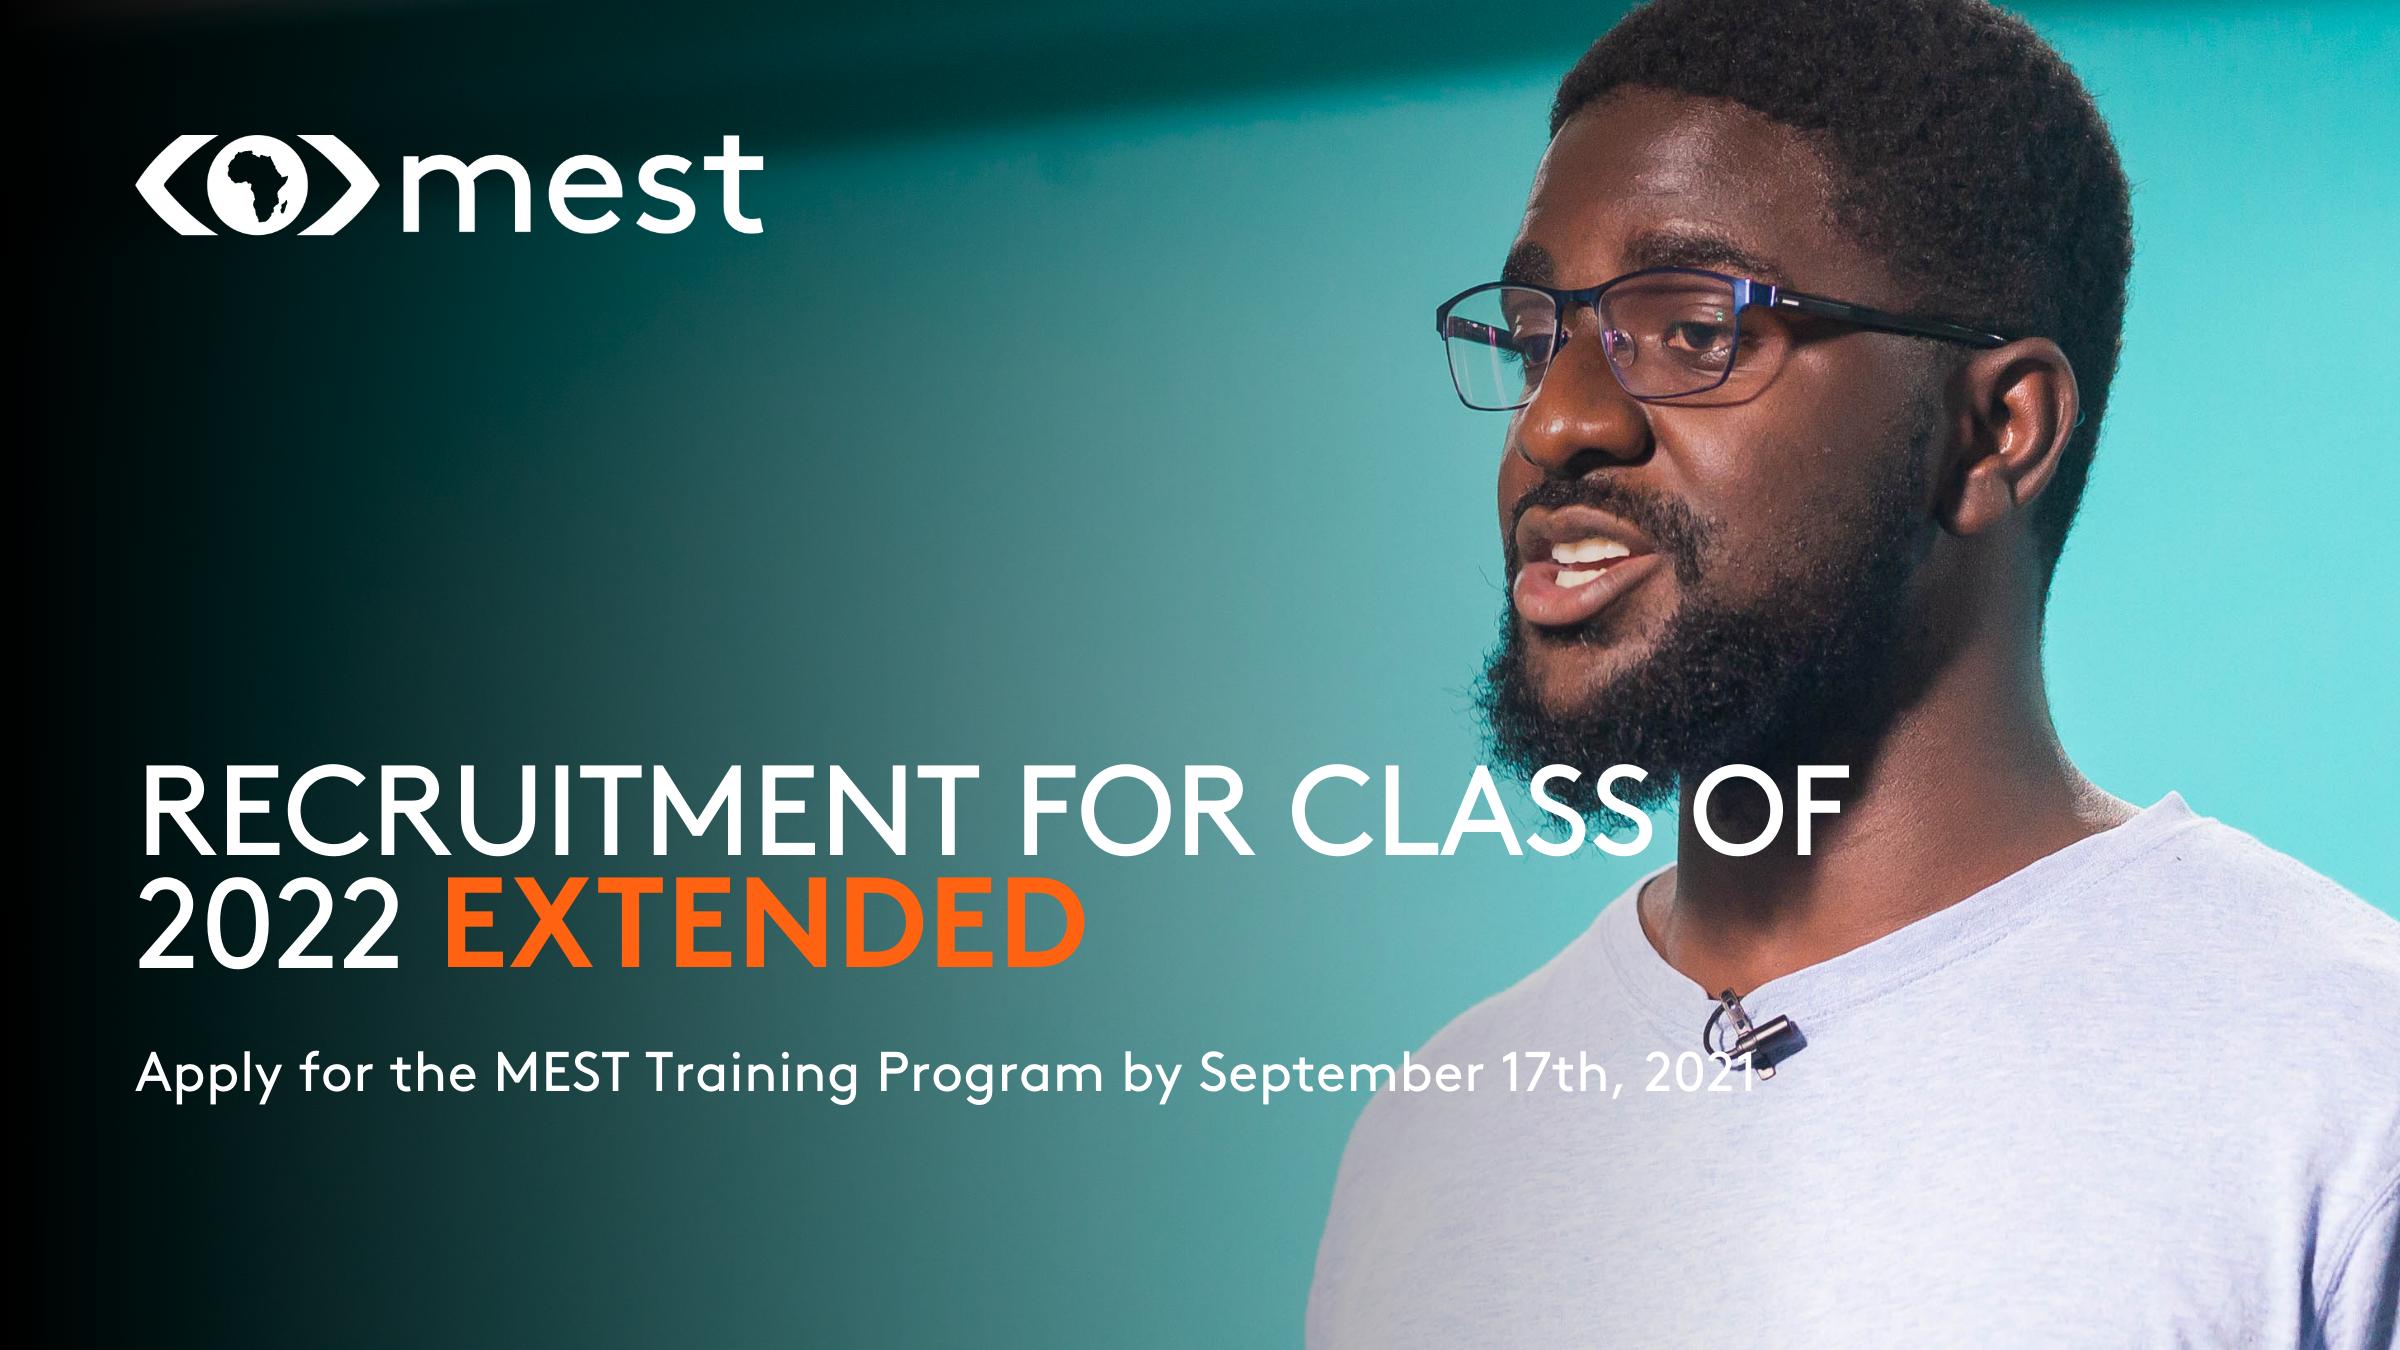 MEST training program extension